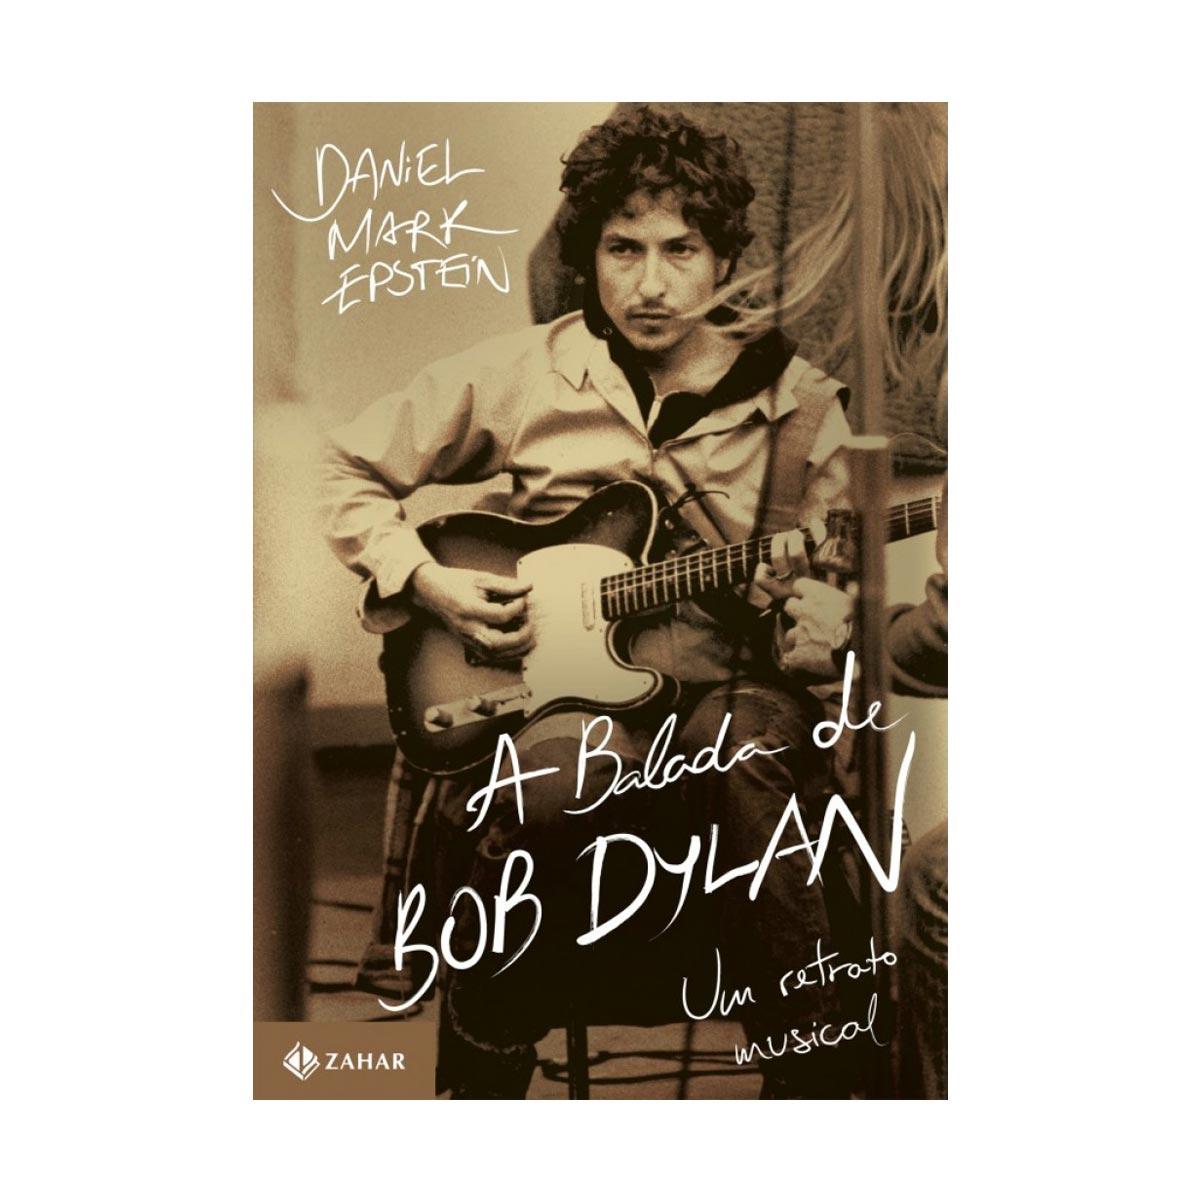 Livro A Balada de Bob Dylan